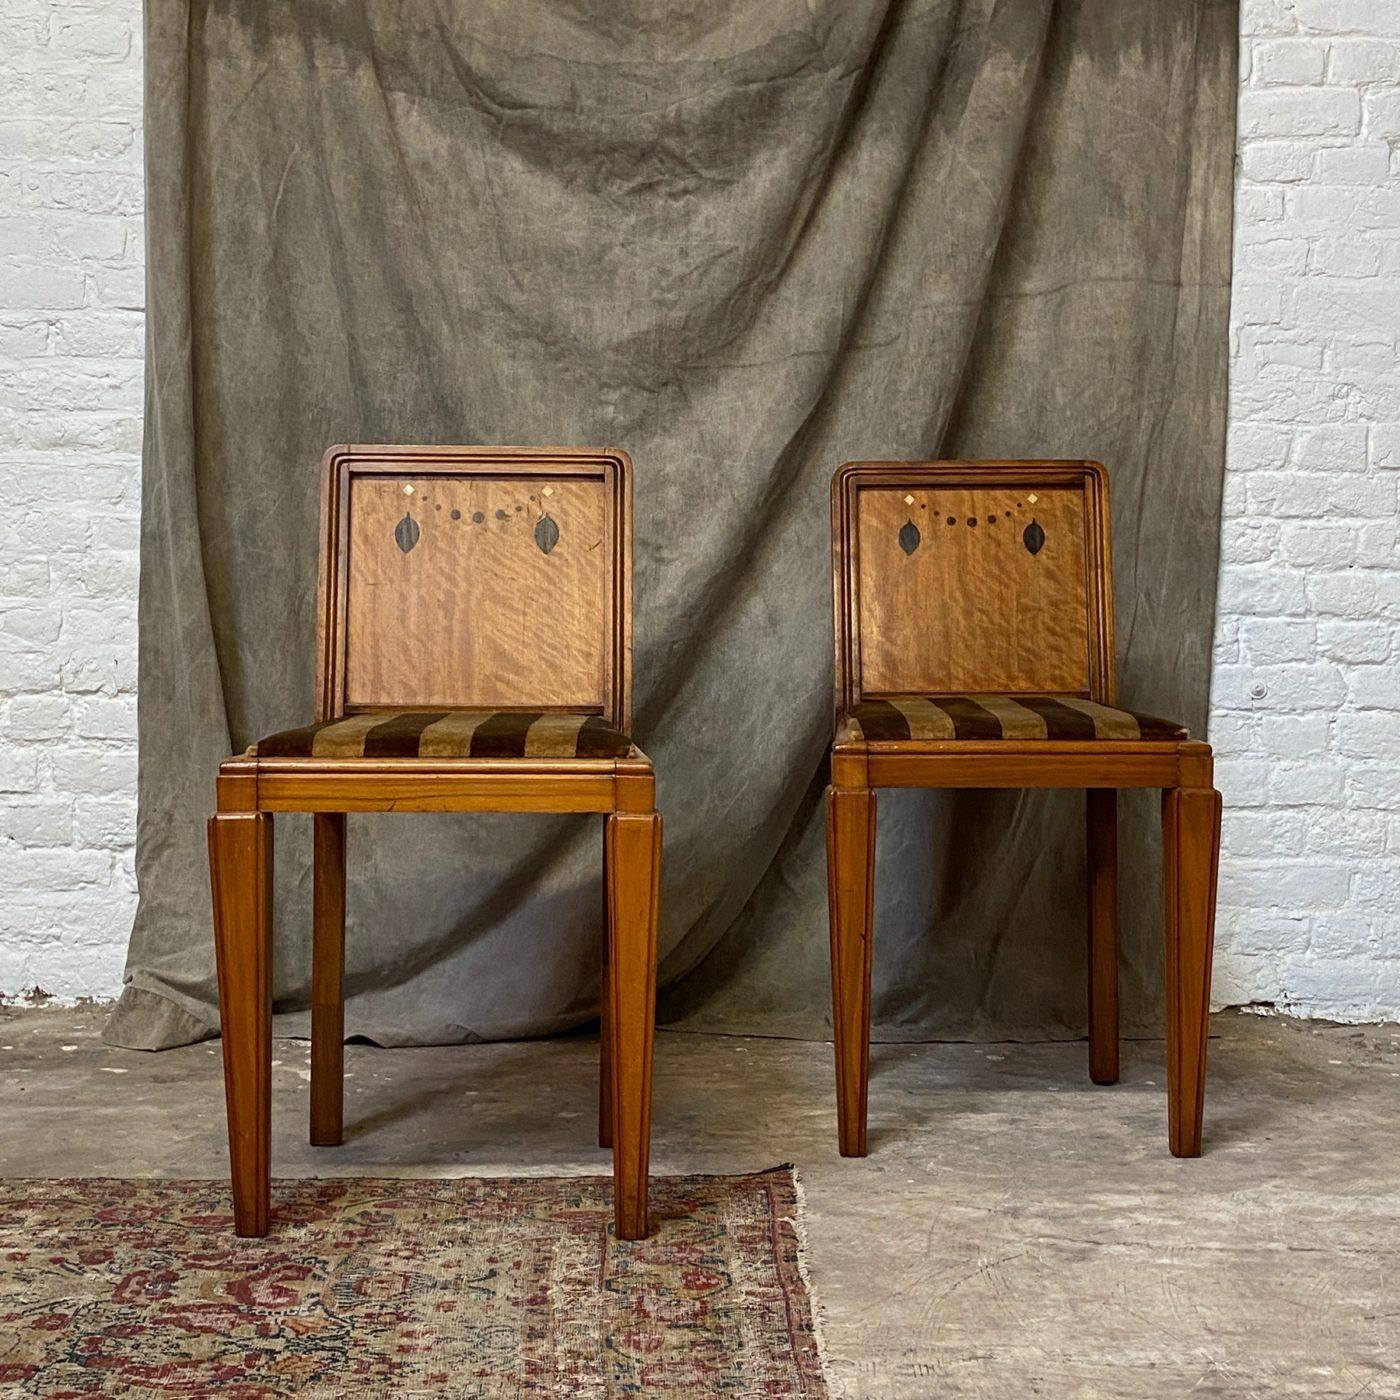 art-deco-chairs0002